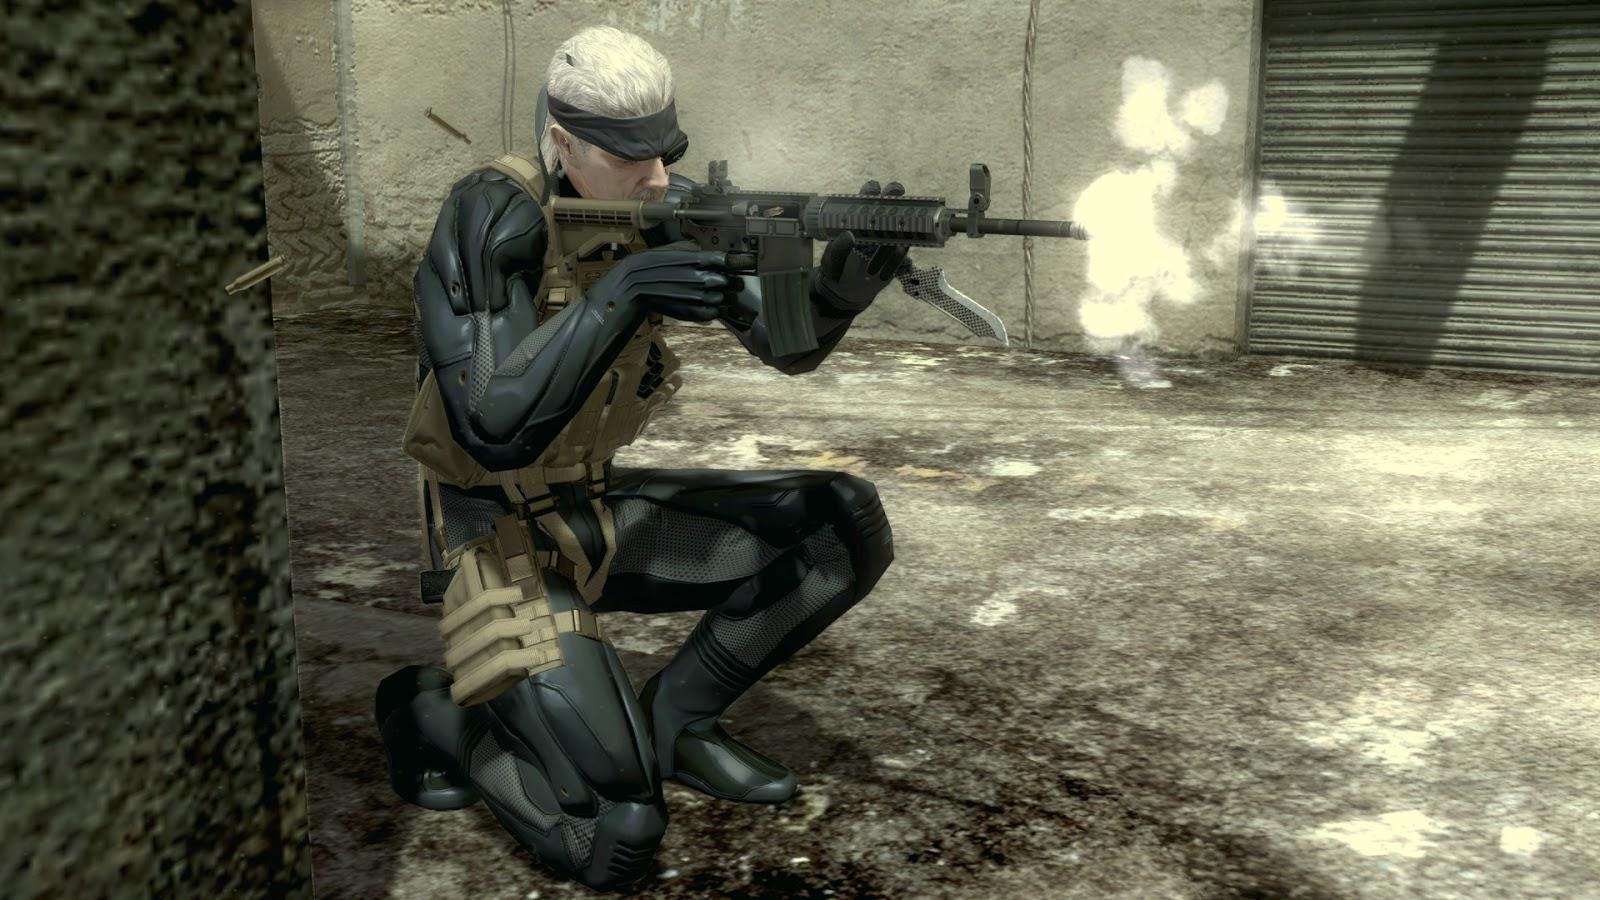 НаPCспомощью эмулятора запустили Metal Gear Solid 4